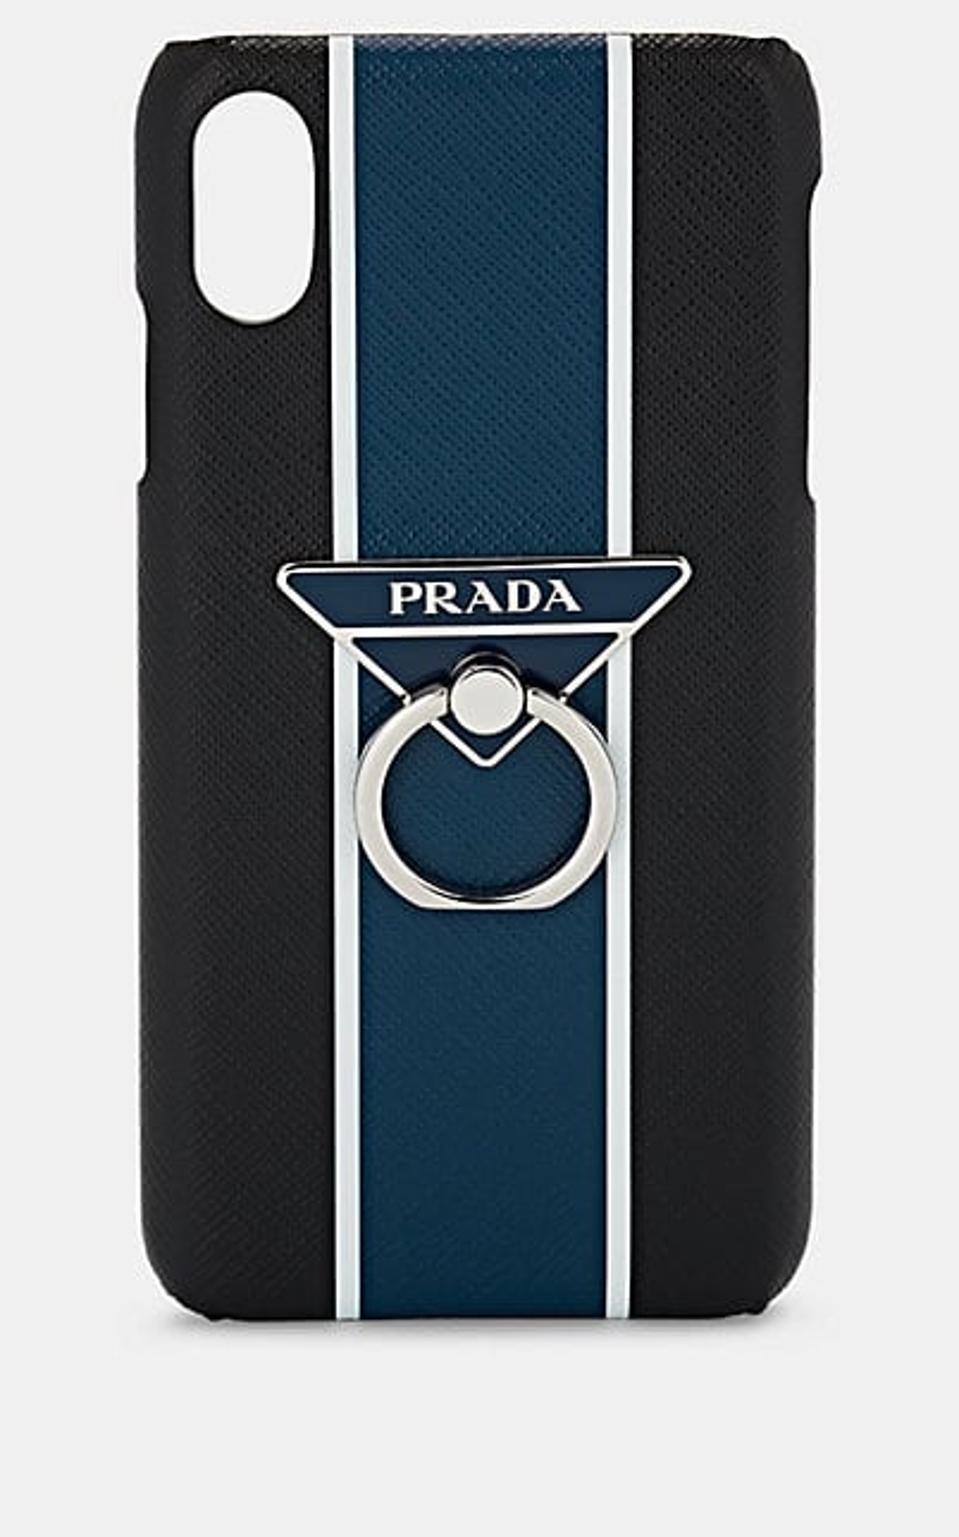 Prada Saffiano Leather iPhone X Case